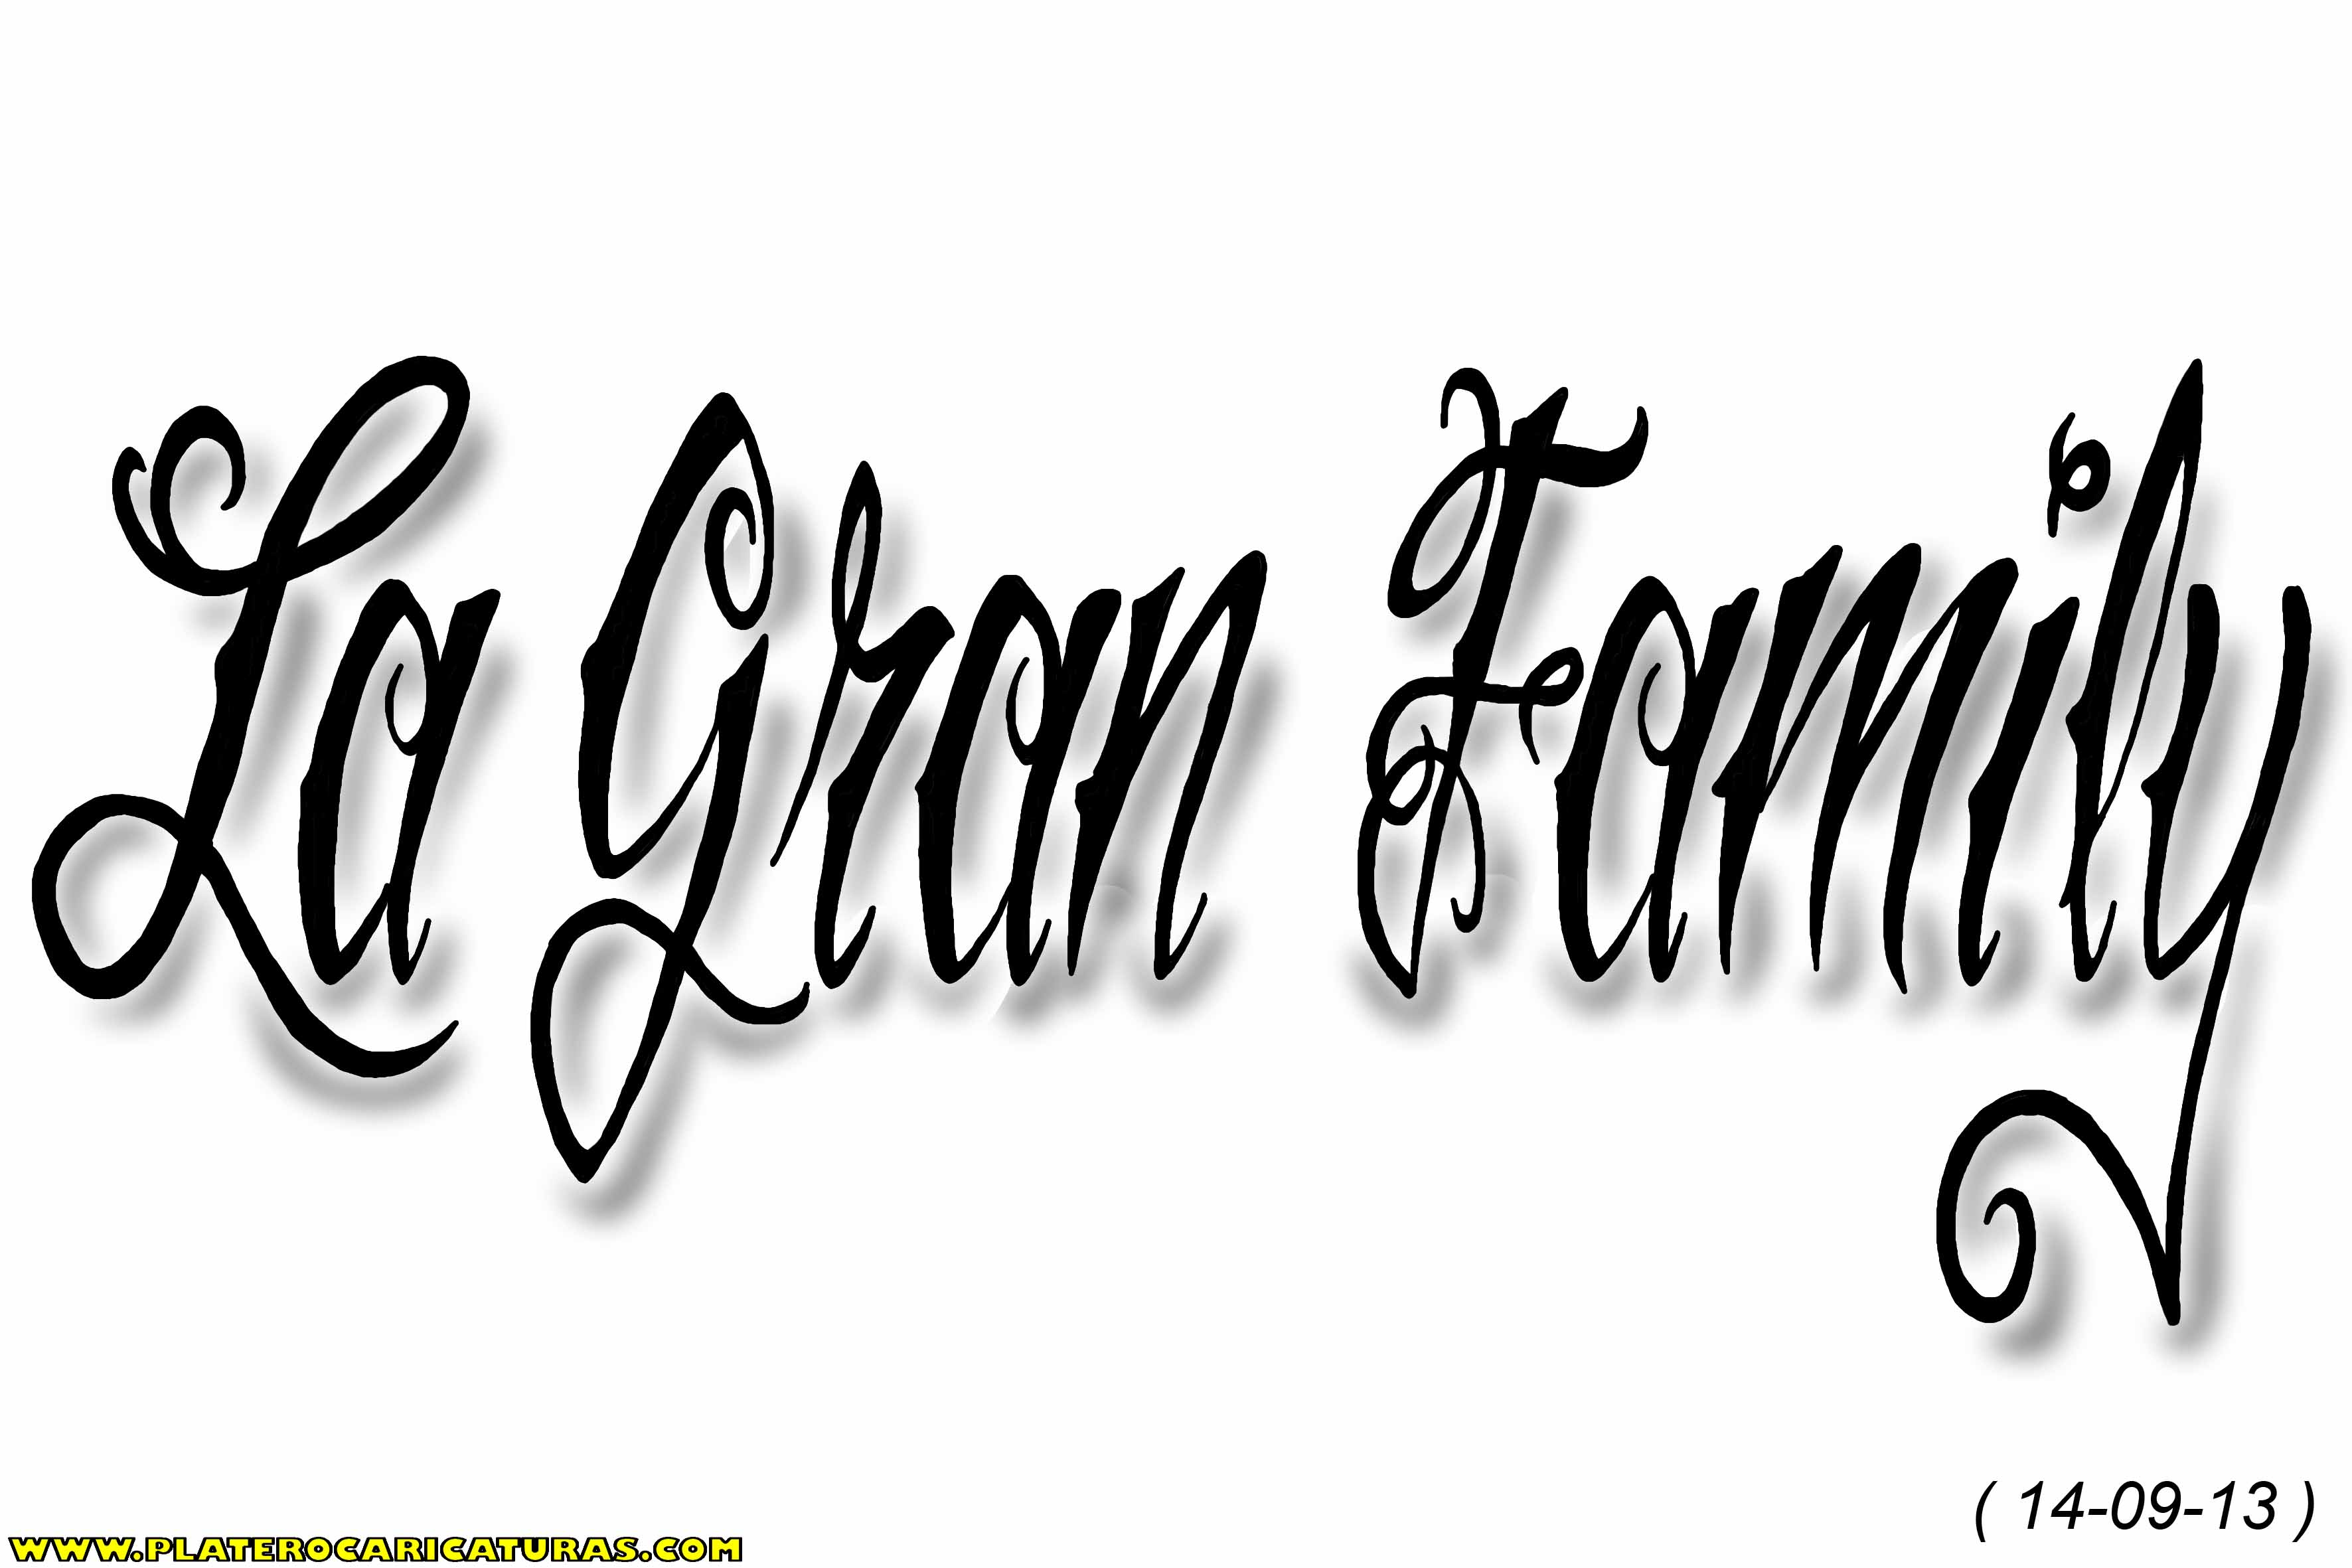 tatuaje_la gran family_platerocaricaturas.jpg